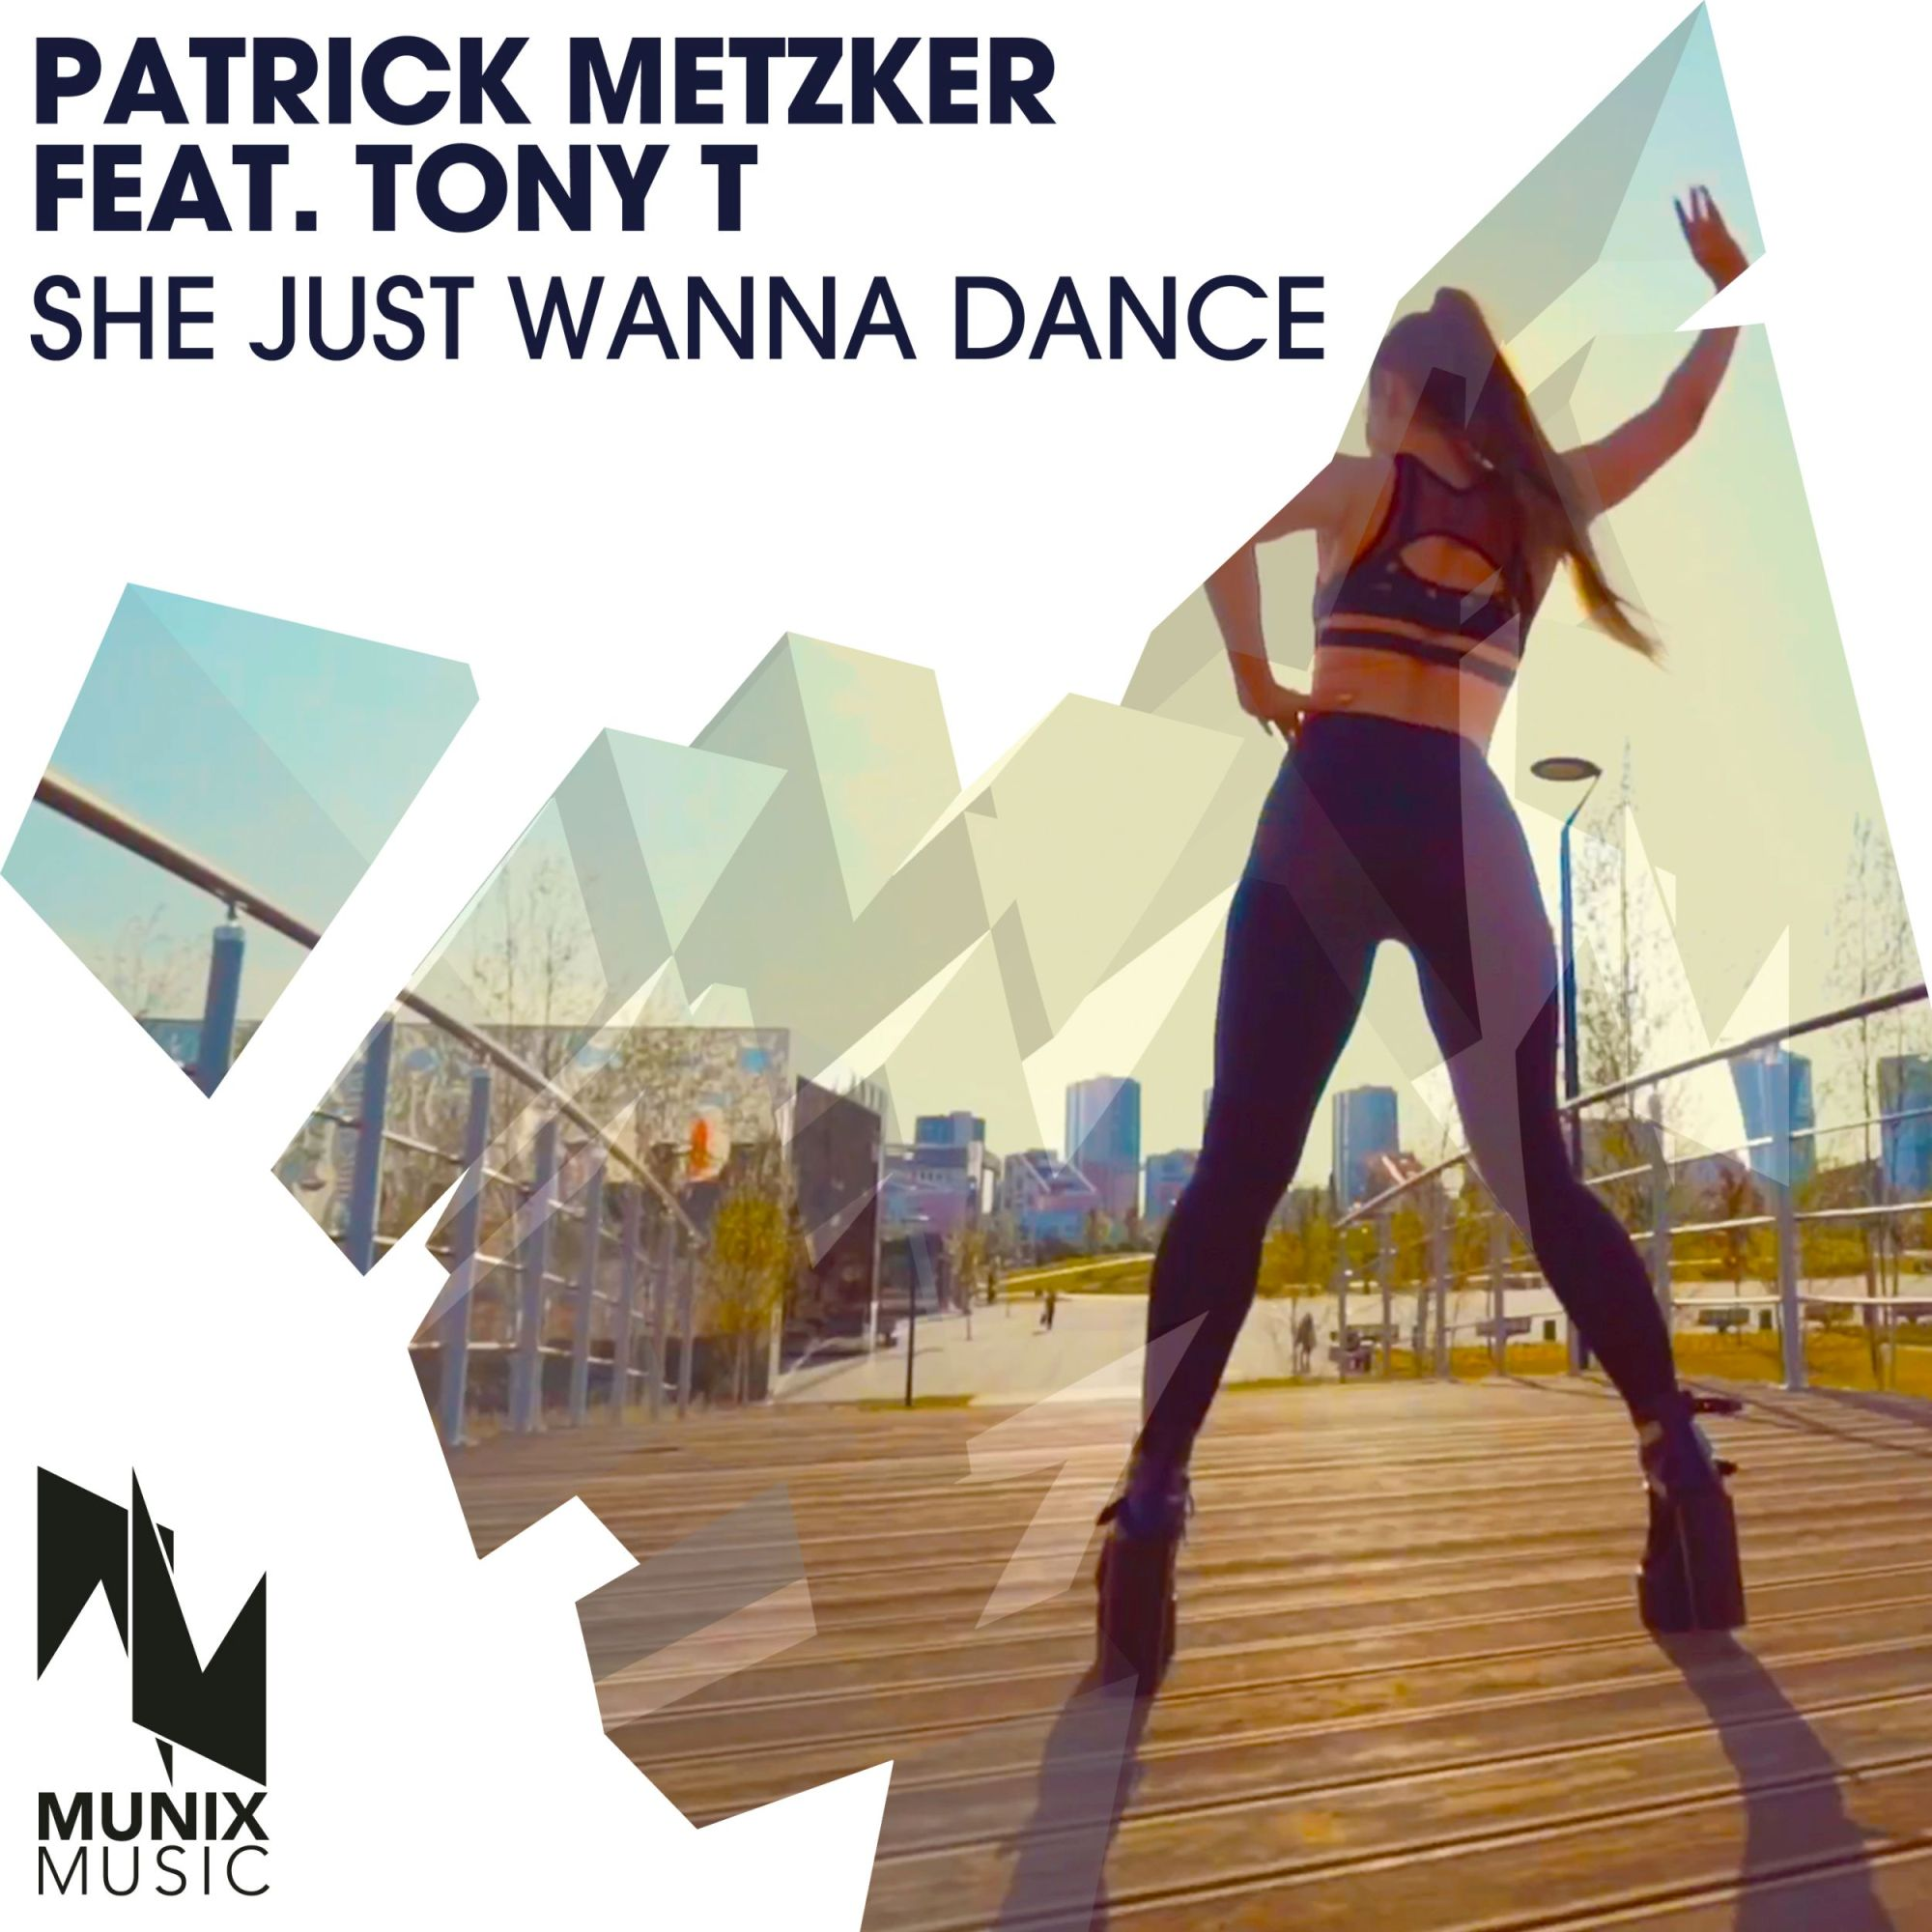 PATRICK METZKER FEAT. TONY T-She Just Wanna Dance